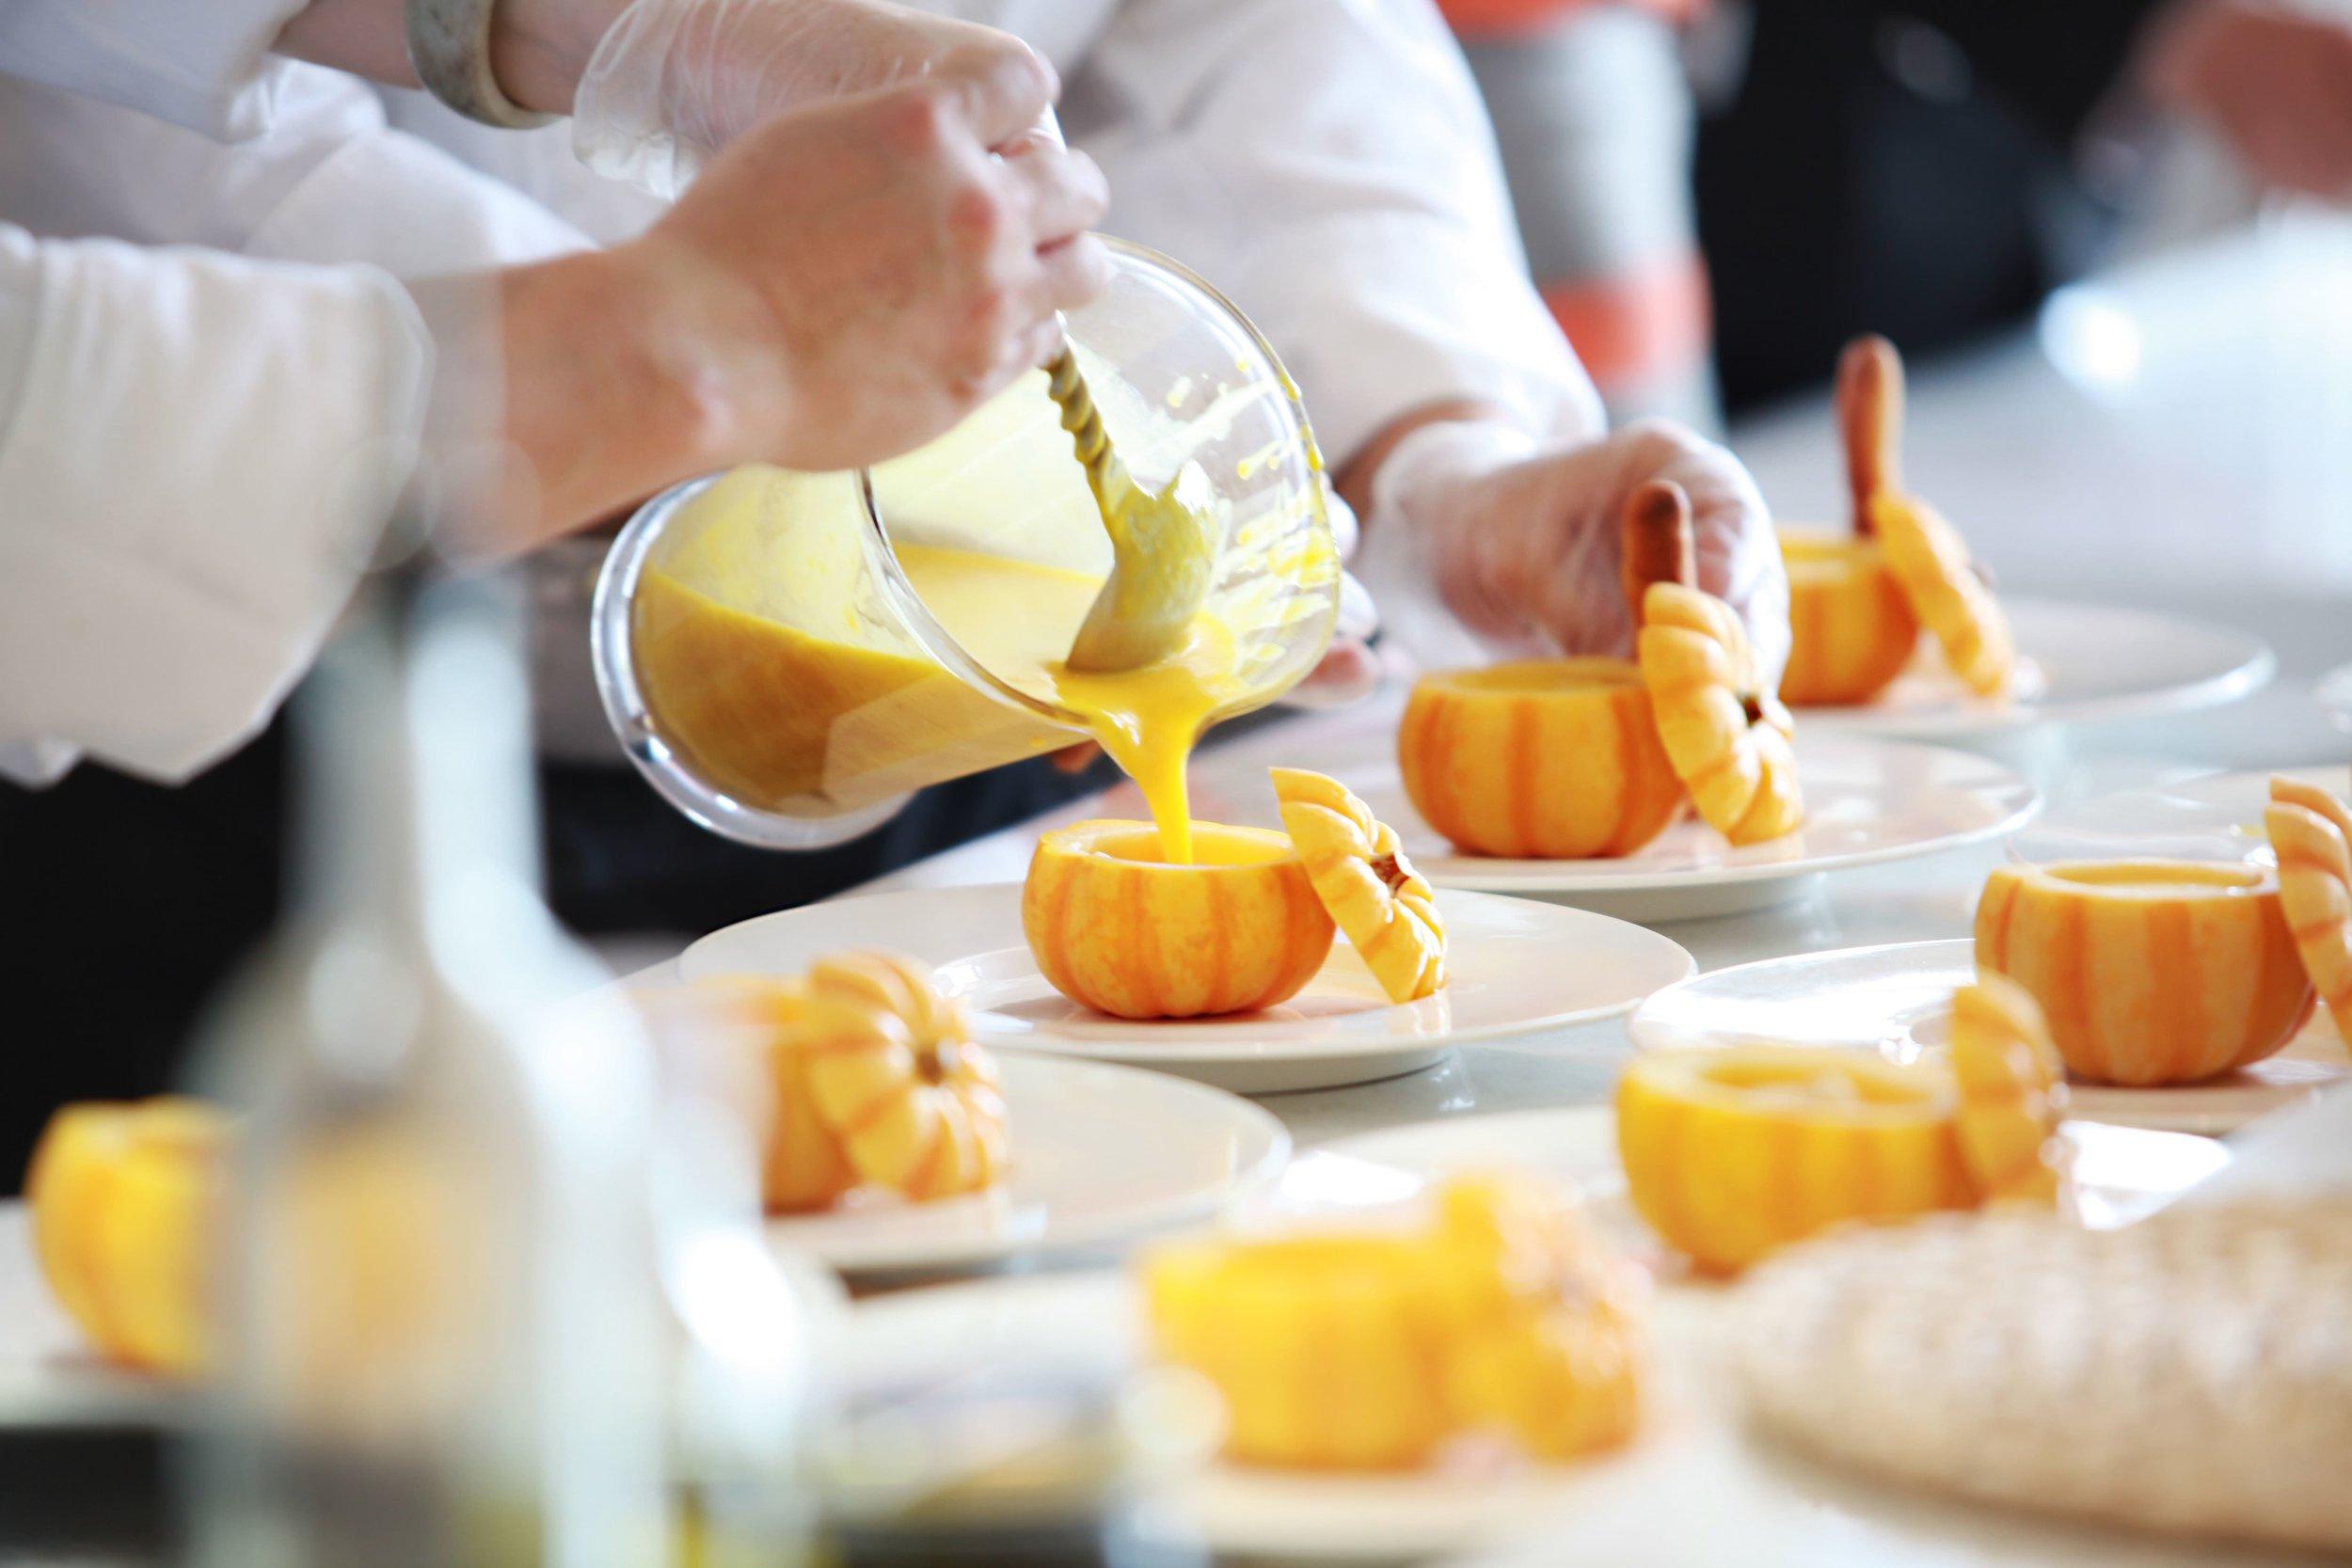 how to cook a whole pumpkin plus 12 pumpkin recipes from www.goingzerowaste.com #zerowaste #pumpkin #pumpkinrecipes #pumpkinpie #pumpkincurry #wholepumpkin #fallrecipes #ecofriendly #sustainablefood #pumpkinsoup #pumpkinpancakes